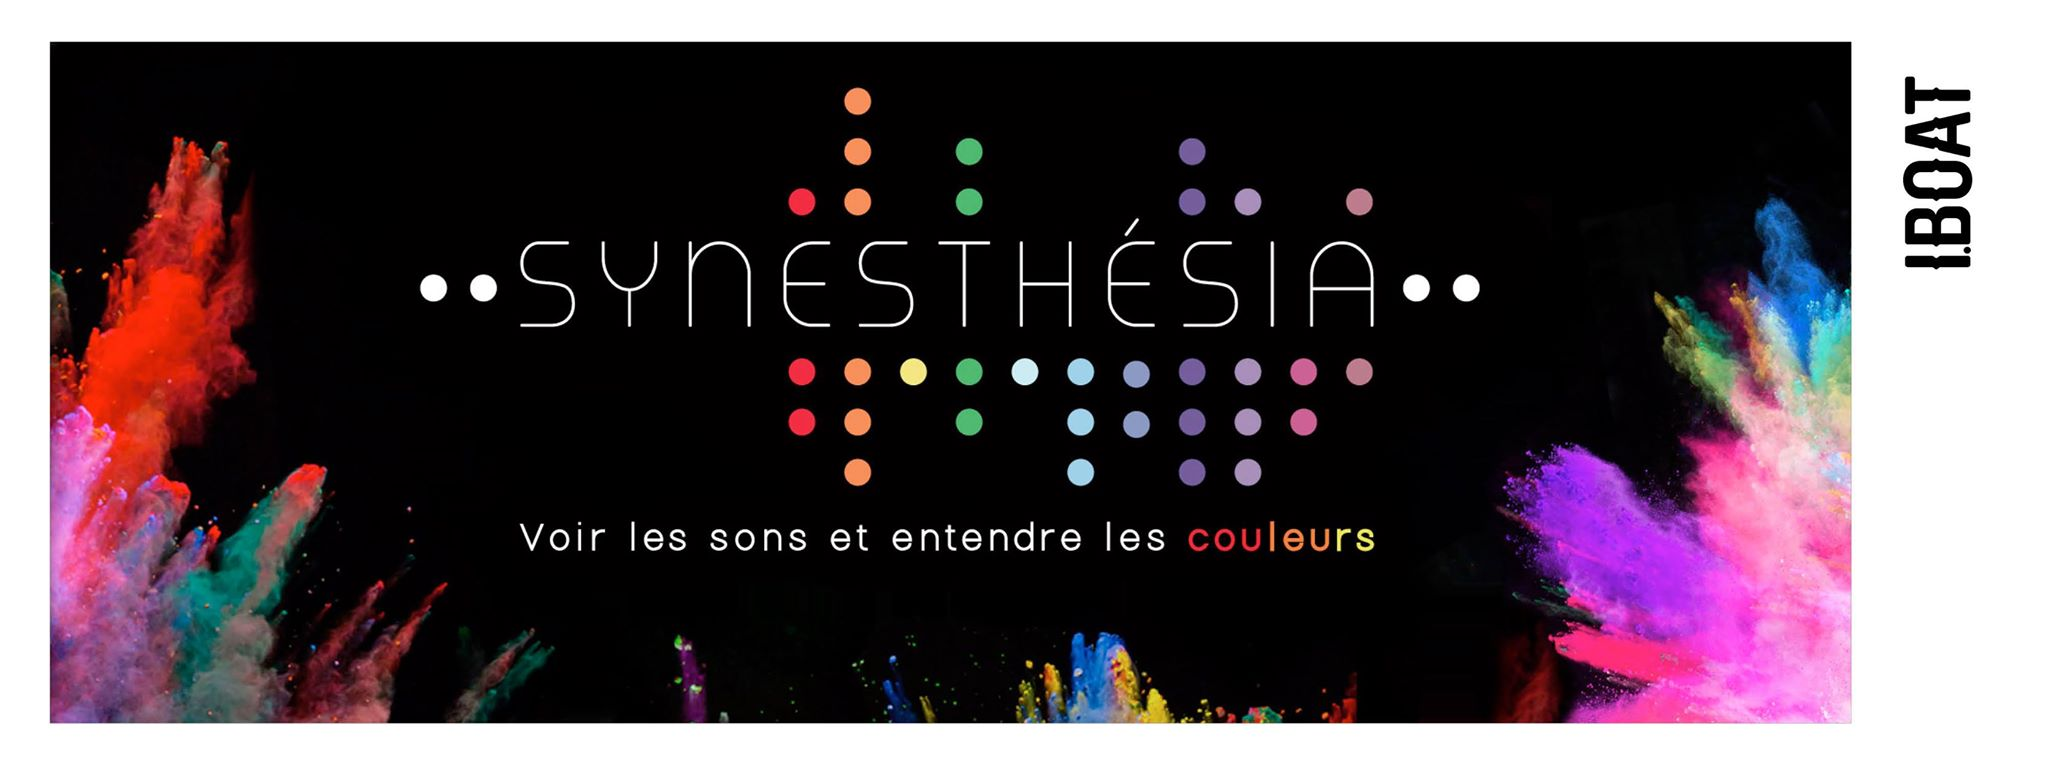 APEROBOAT Synesthésia – Mardi 19 avril 2016